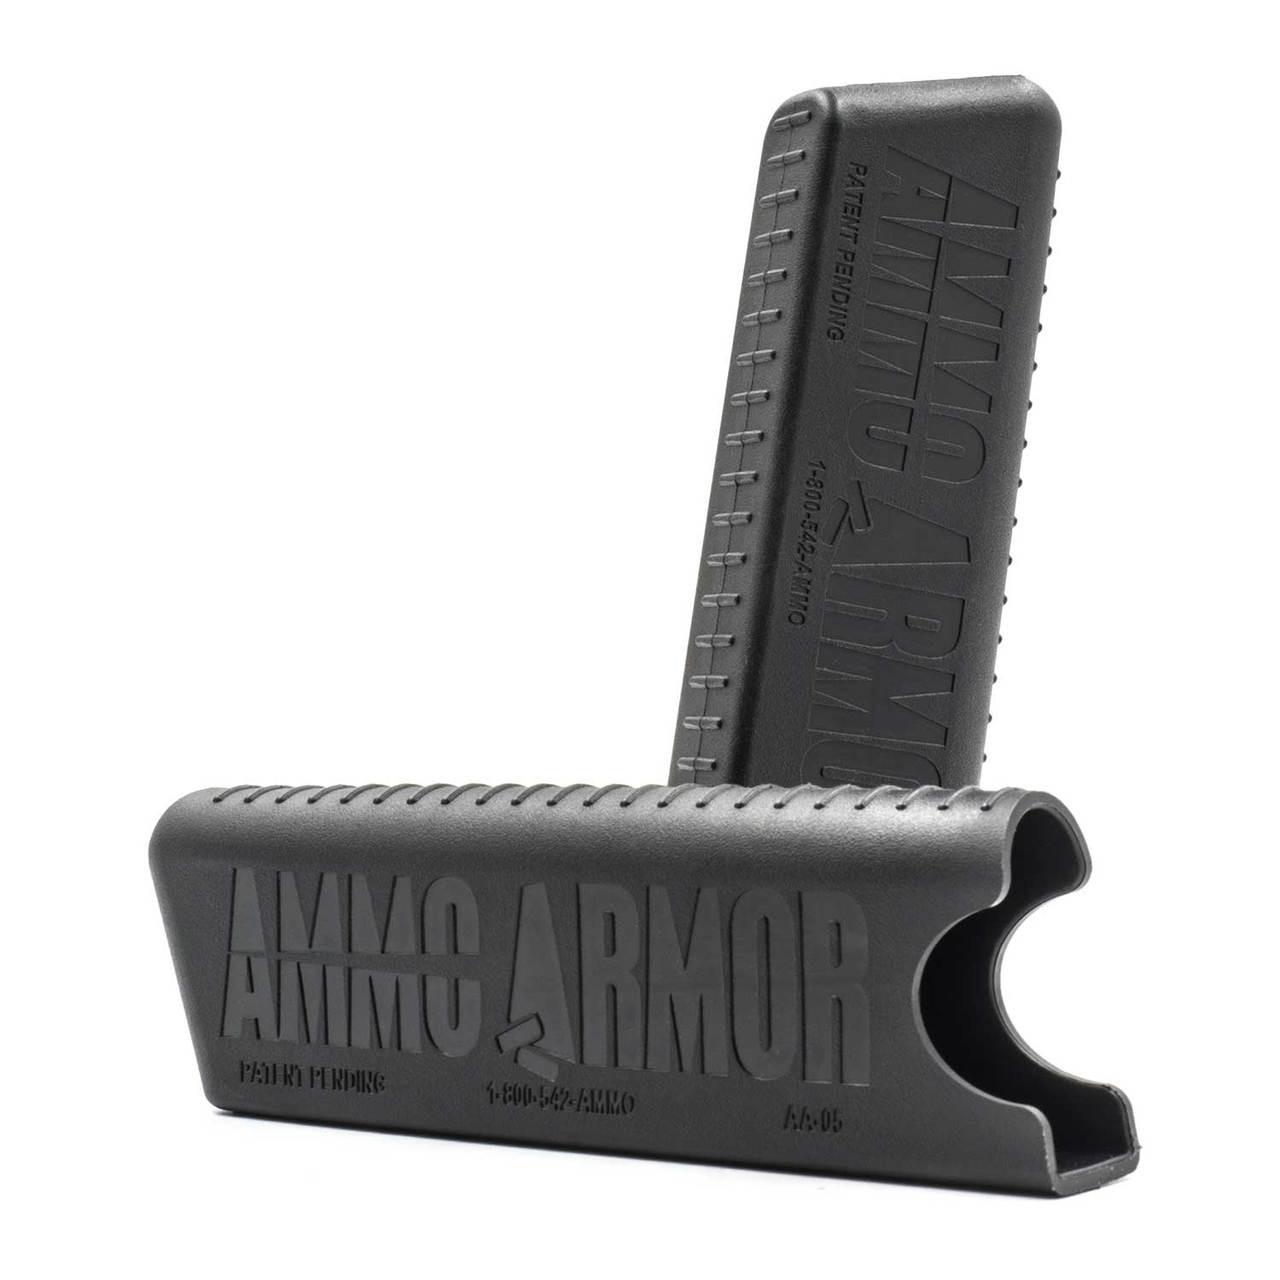 Wilson Combat ULC (.45) Ammo Armor